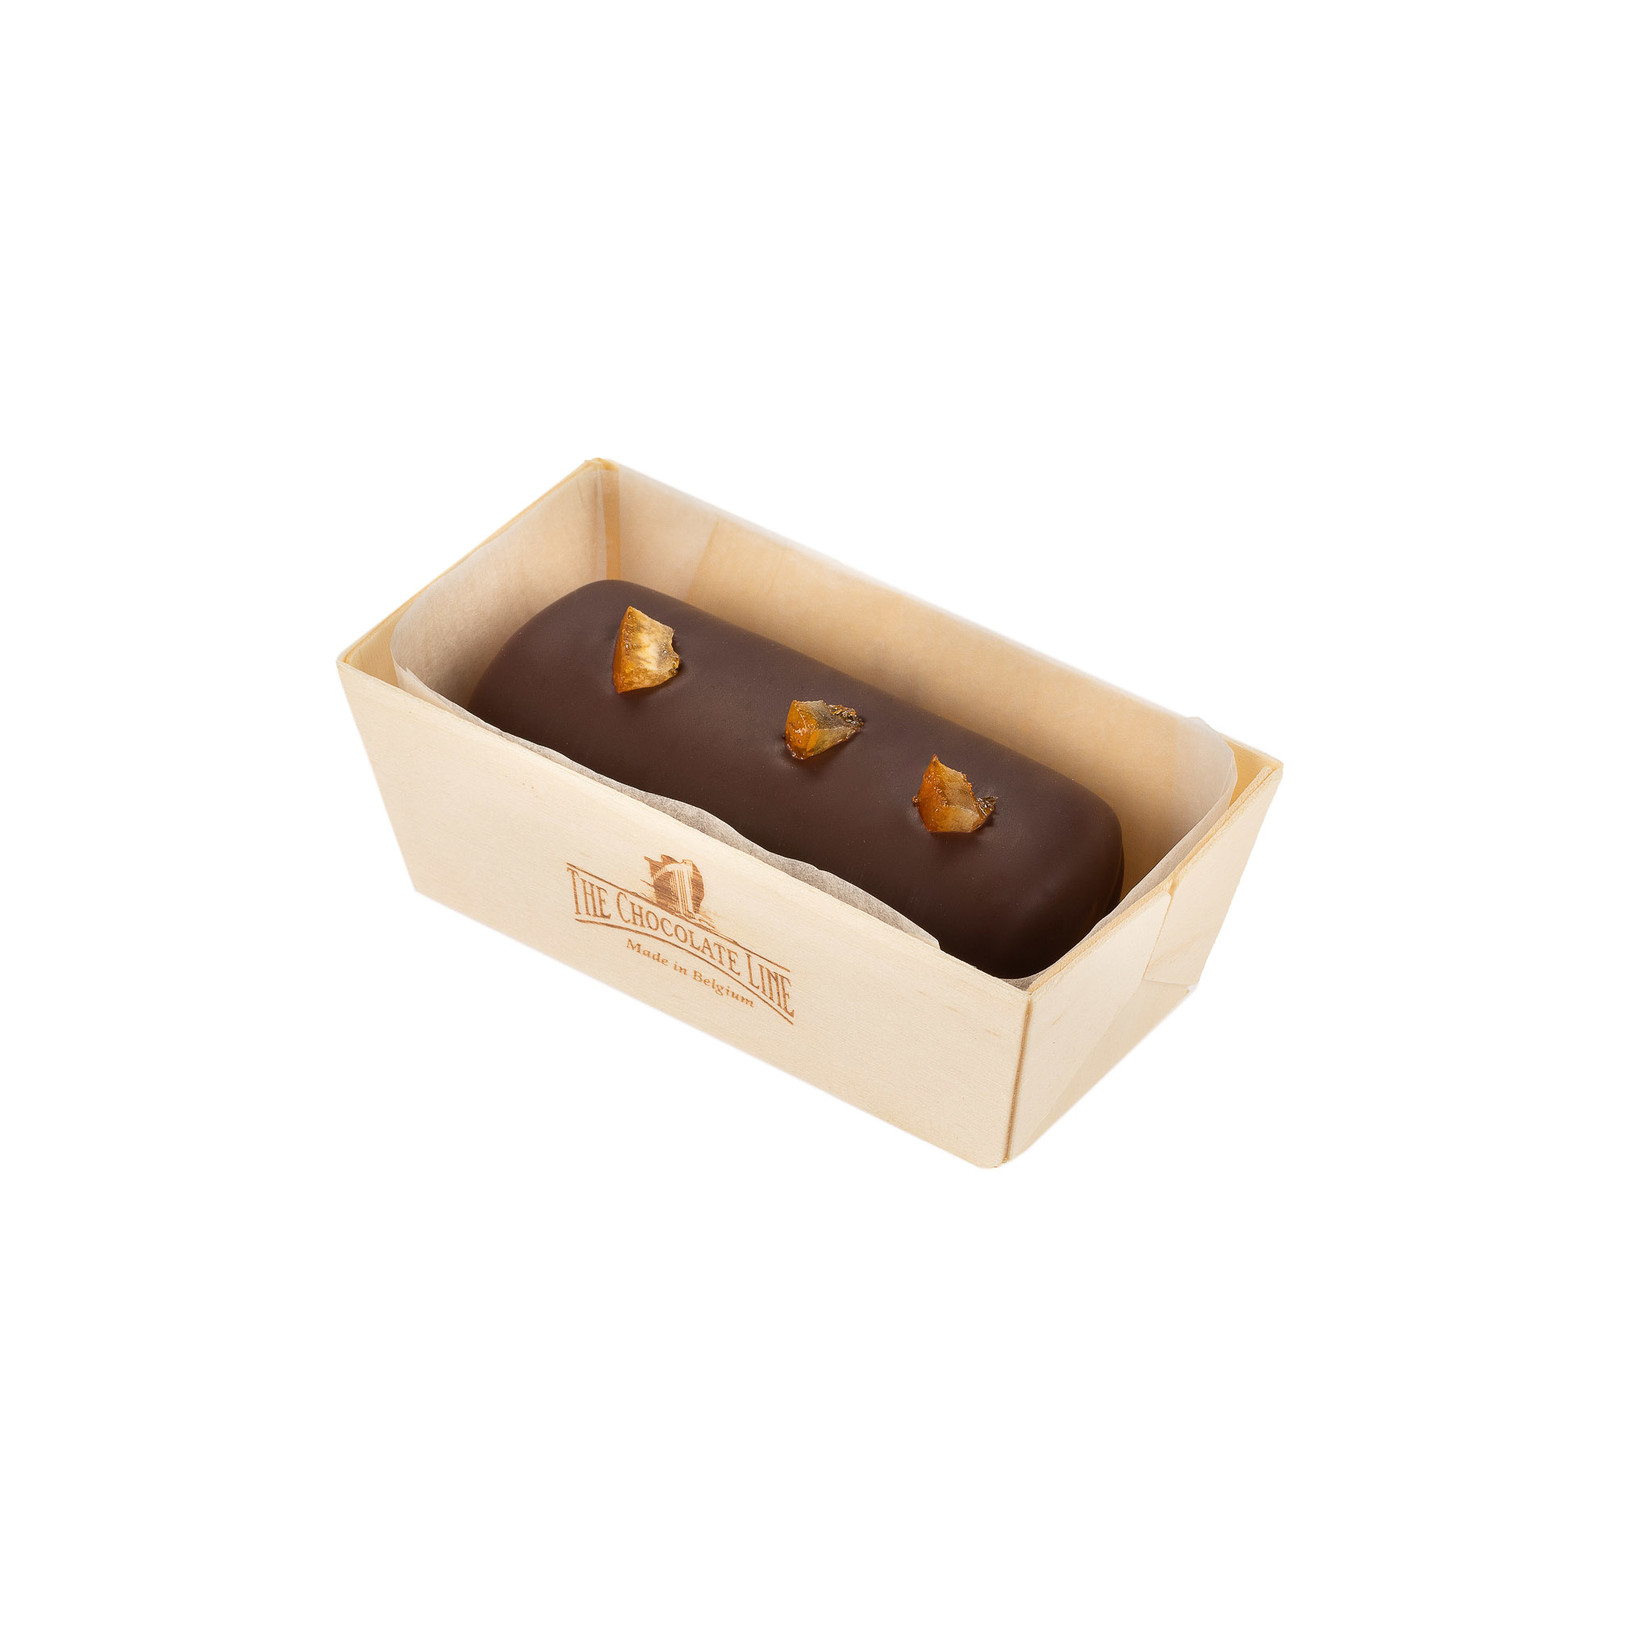 Marzipan with chocolate